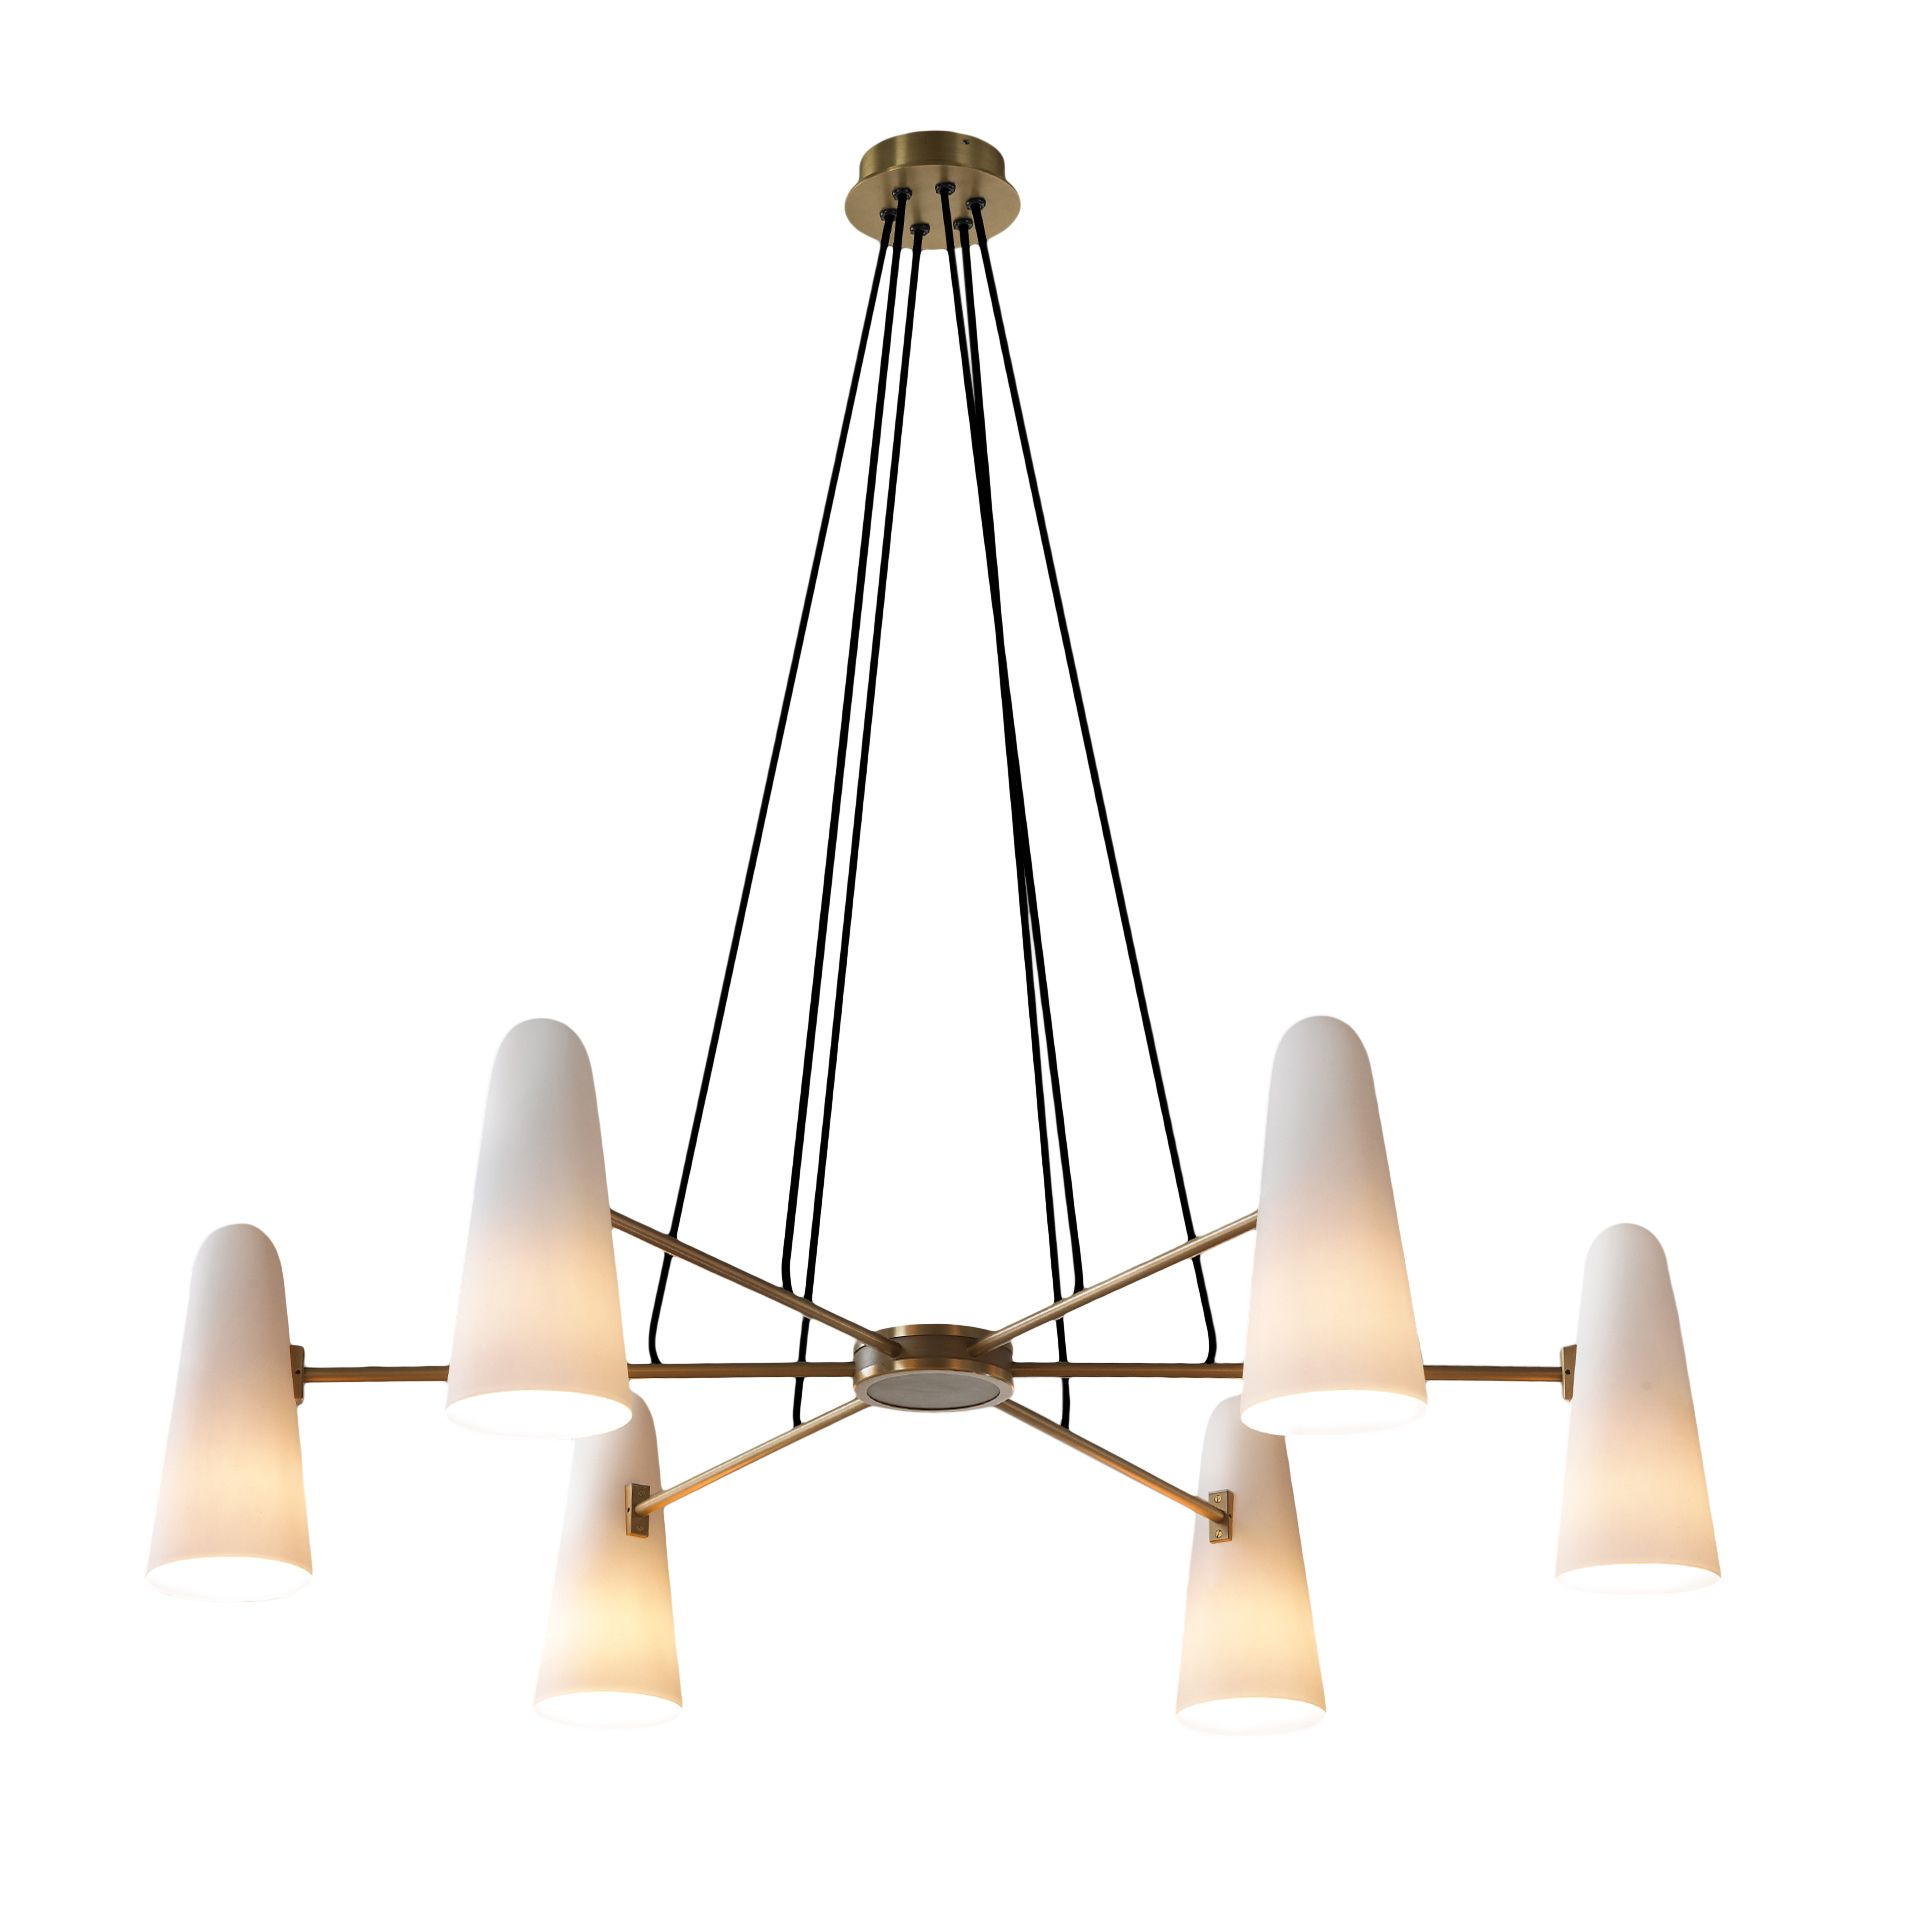 jonathan browning lighting. Jonathan Browning Lighting. Buy Jbs Montfaucon Chandelier By Studios - Made-to Lighting D